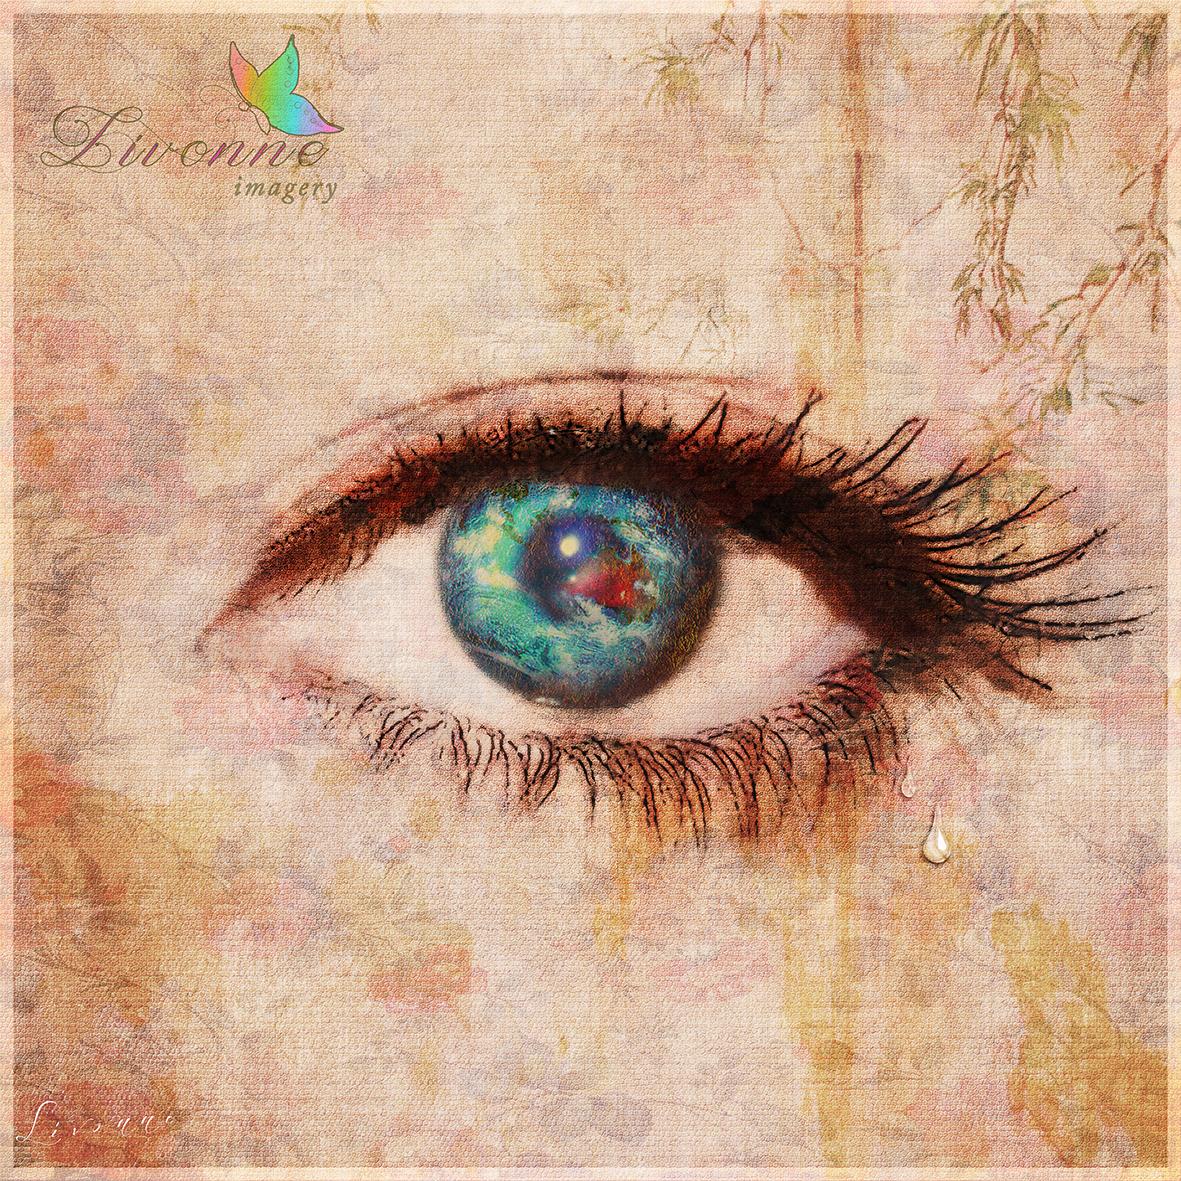 with Fresh eyes – Livonne Imagery